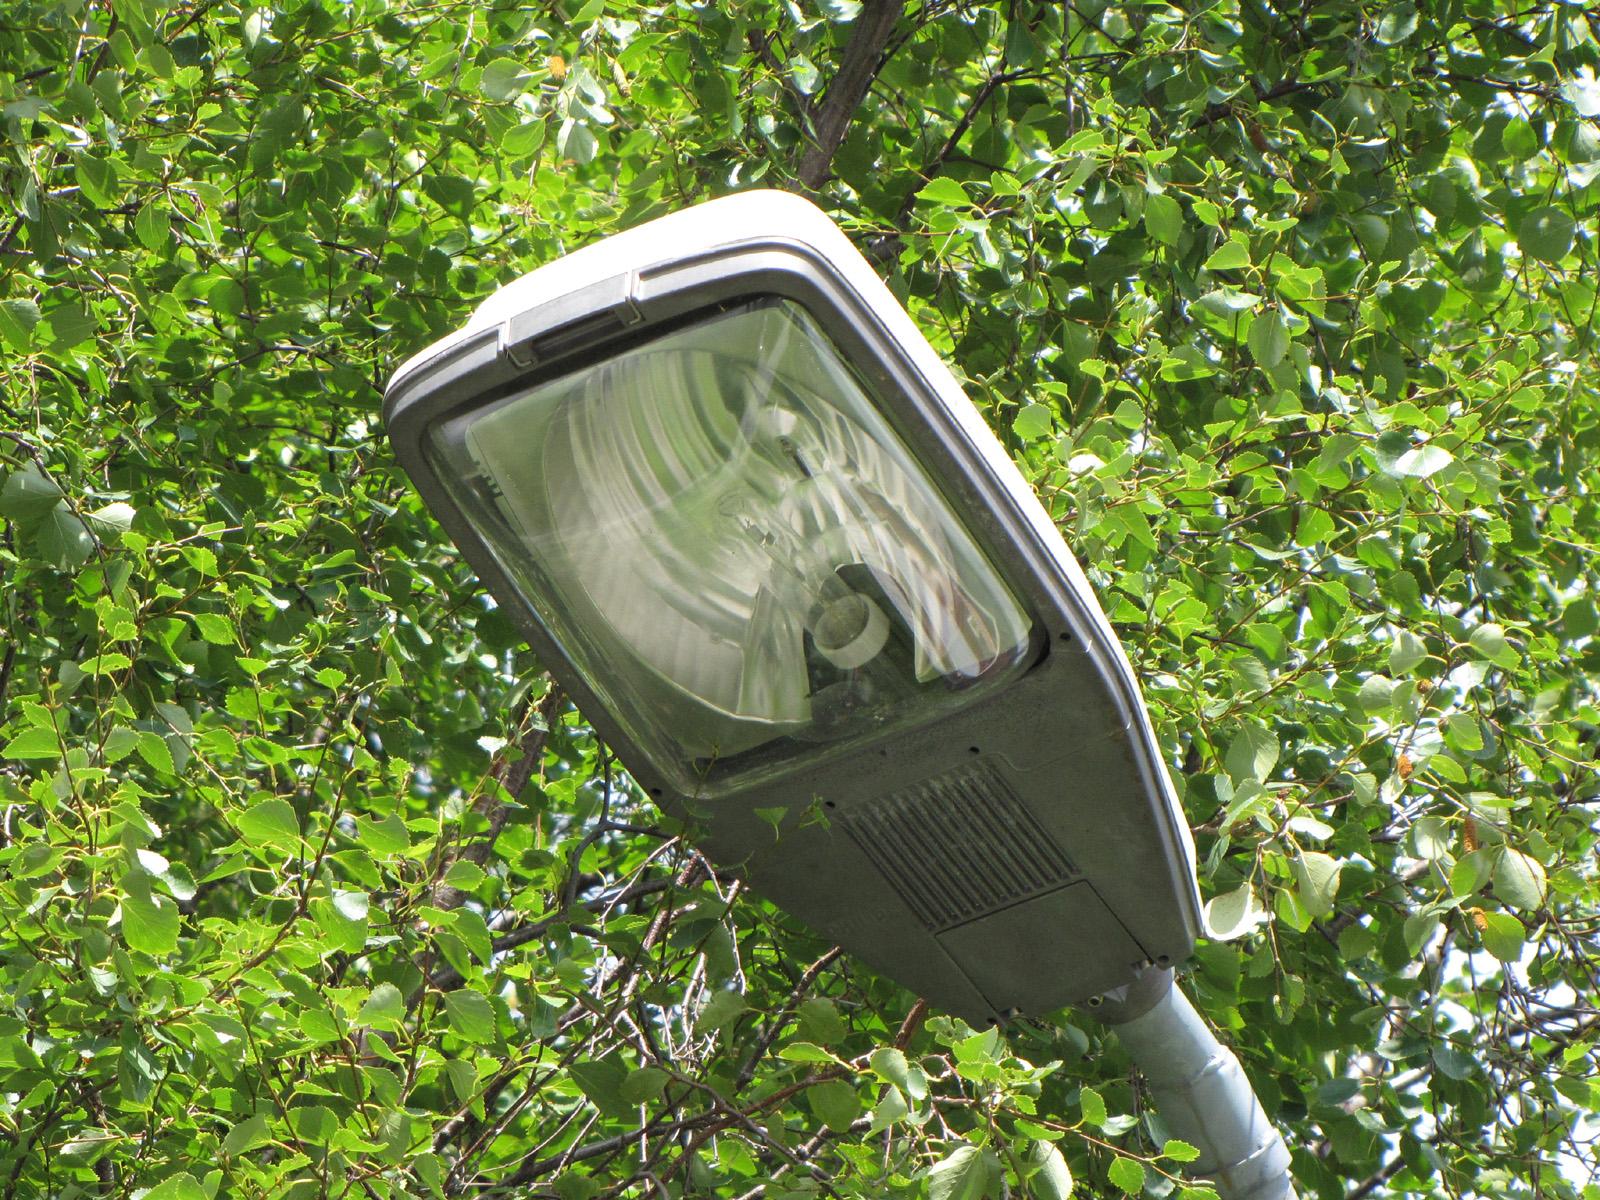 FileSodium vapor l& in Sweden.jpg & File:Sodium vapor lamp in Sweden.jpg - Wikimedia Commons azcodes.com